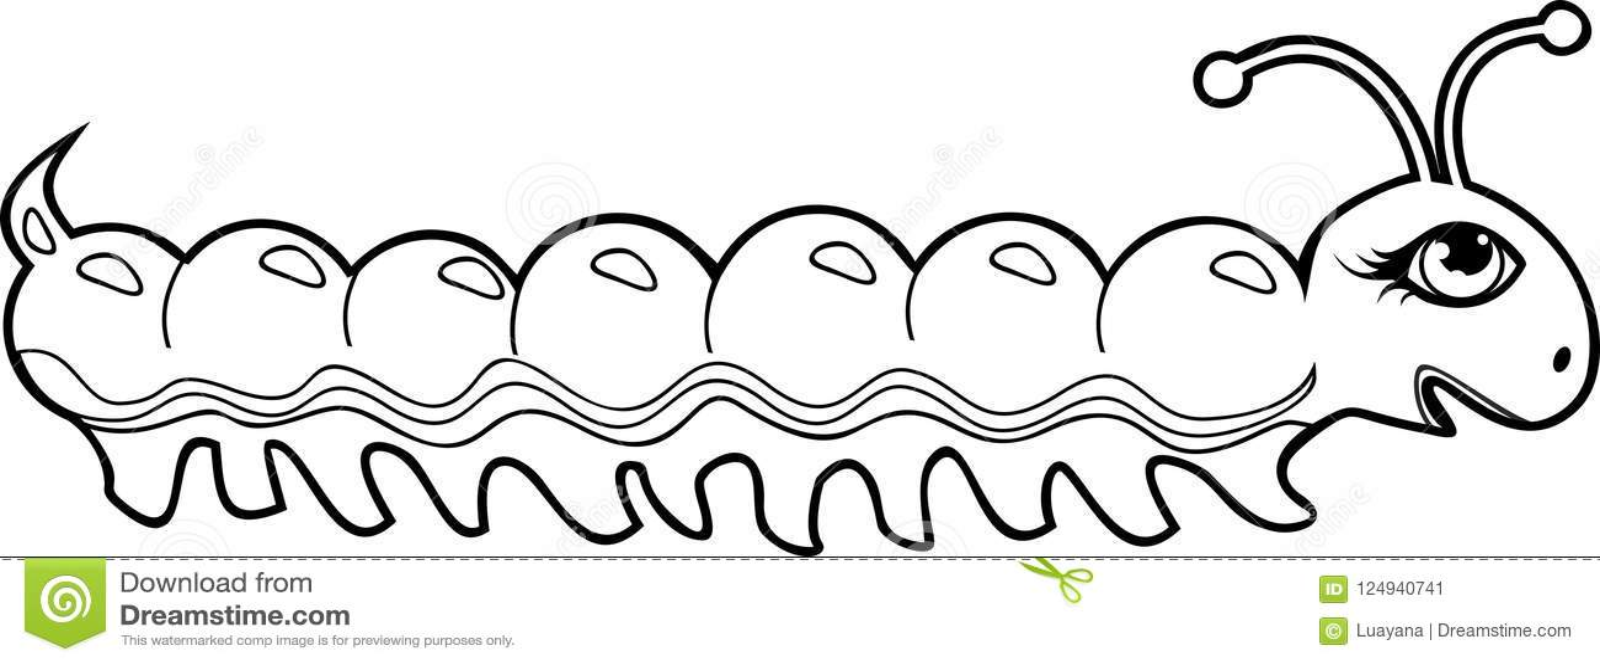 Cute Cartoon Caterpillar Coloring Page Stock Vector